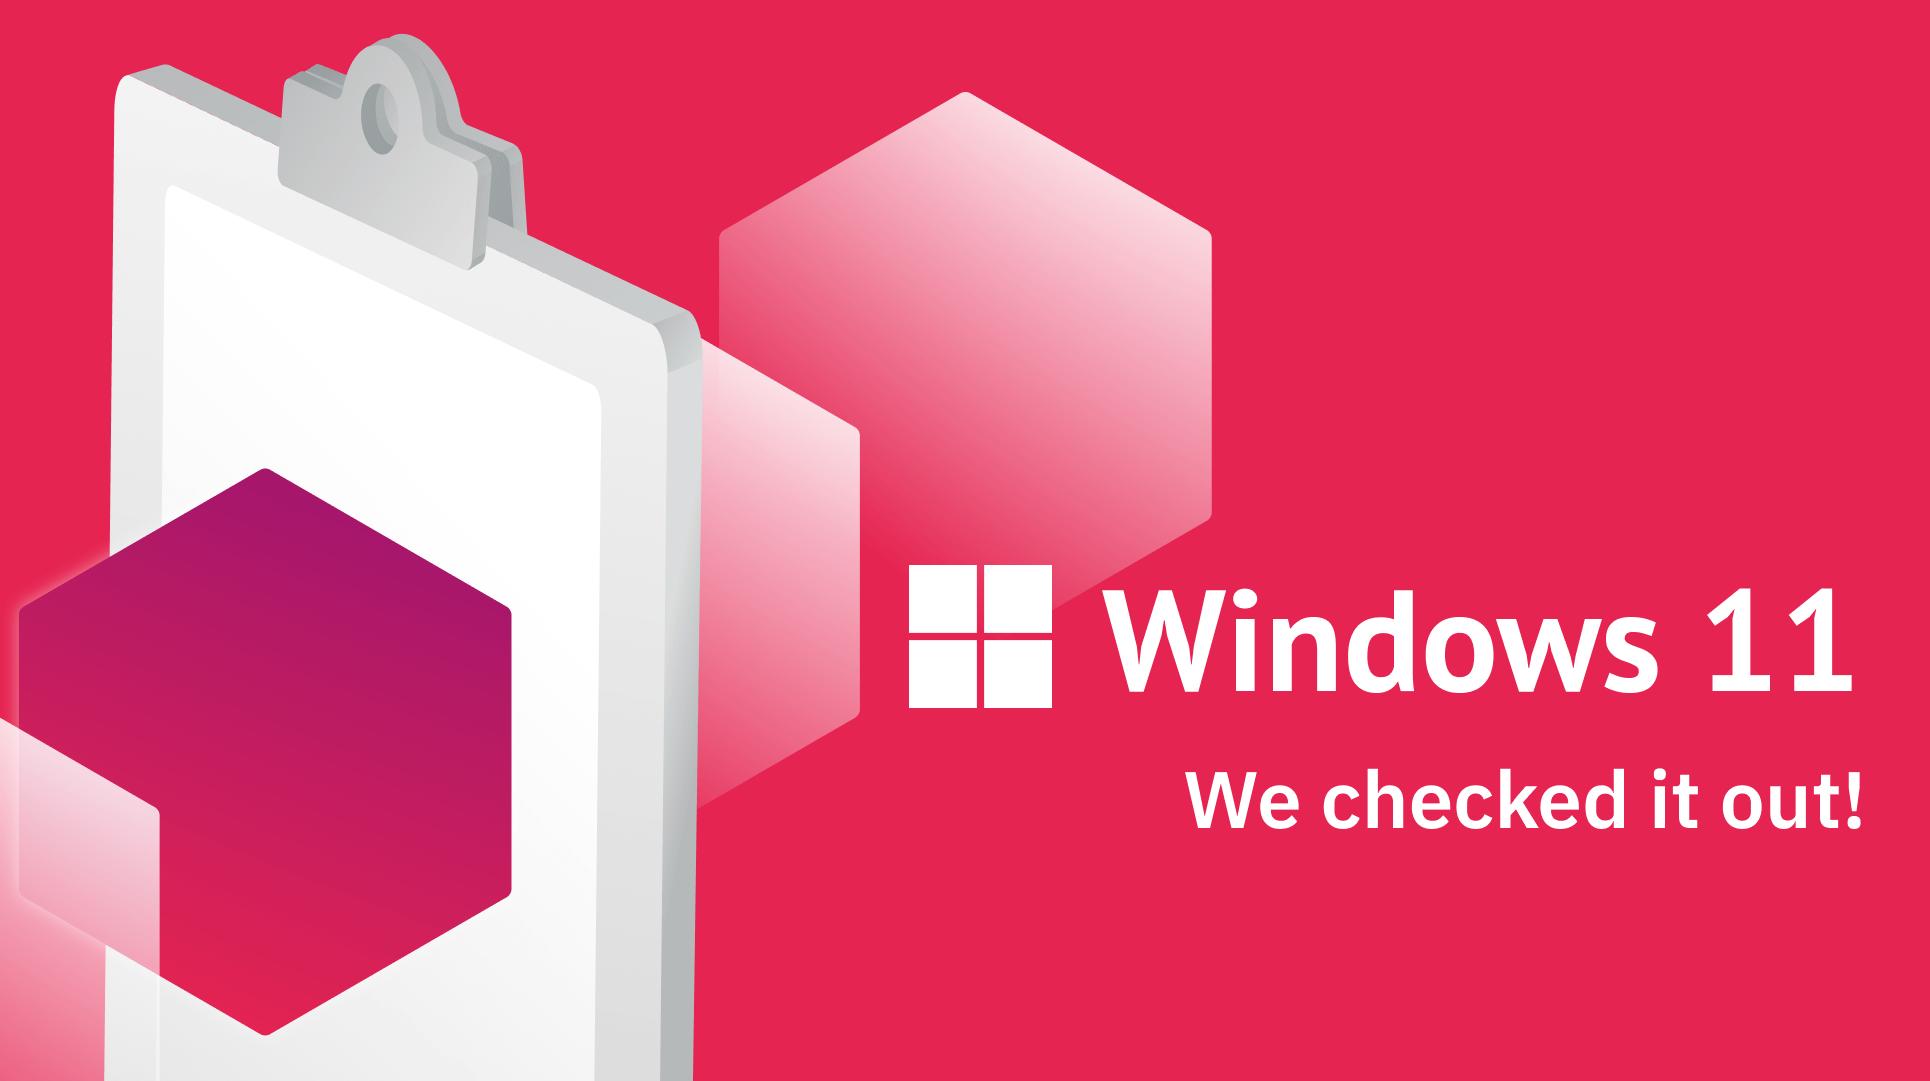 Windows 11 software packaging